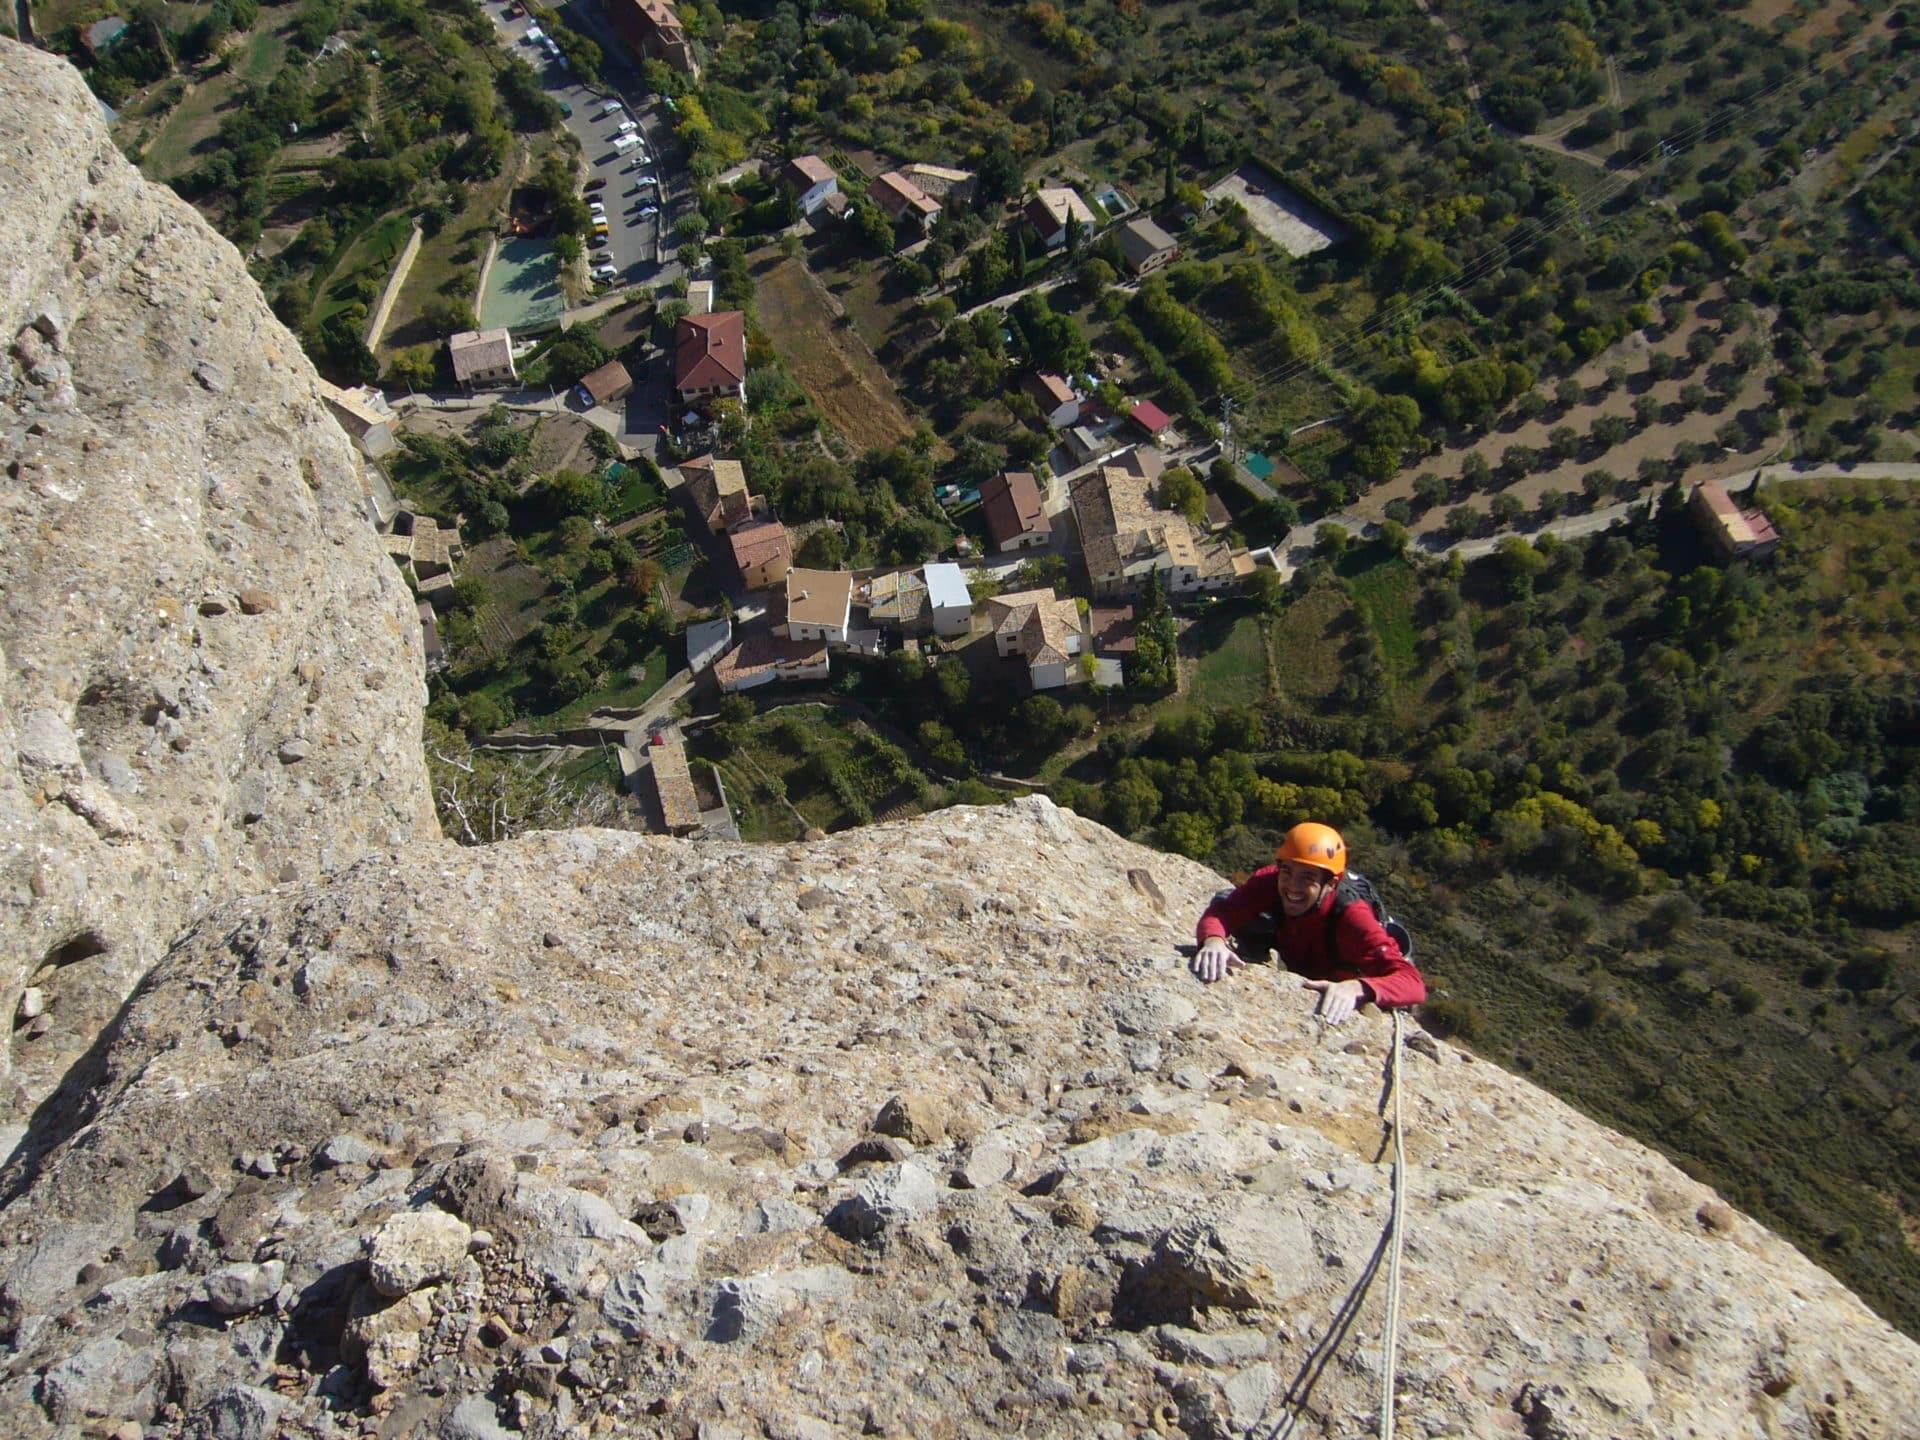 Catalonia multi-pitch rock climbing initiation course